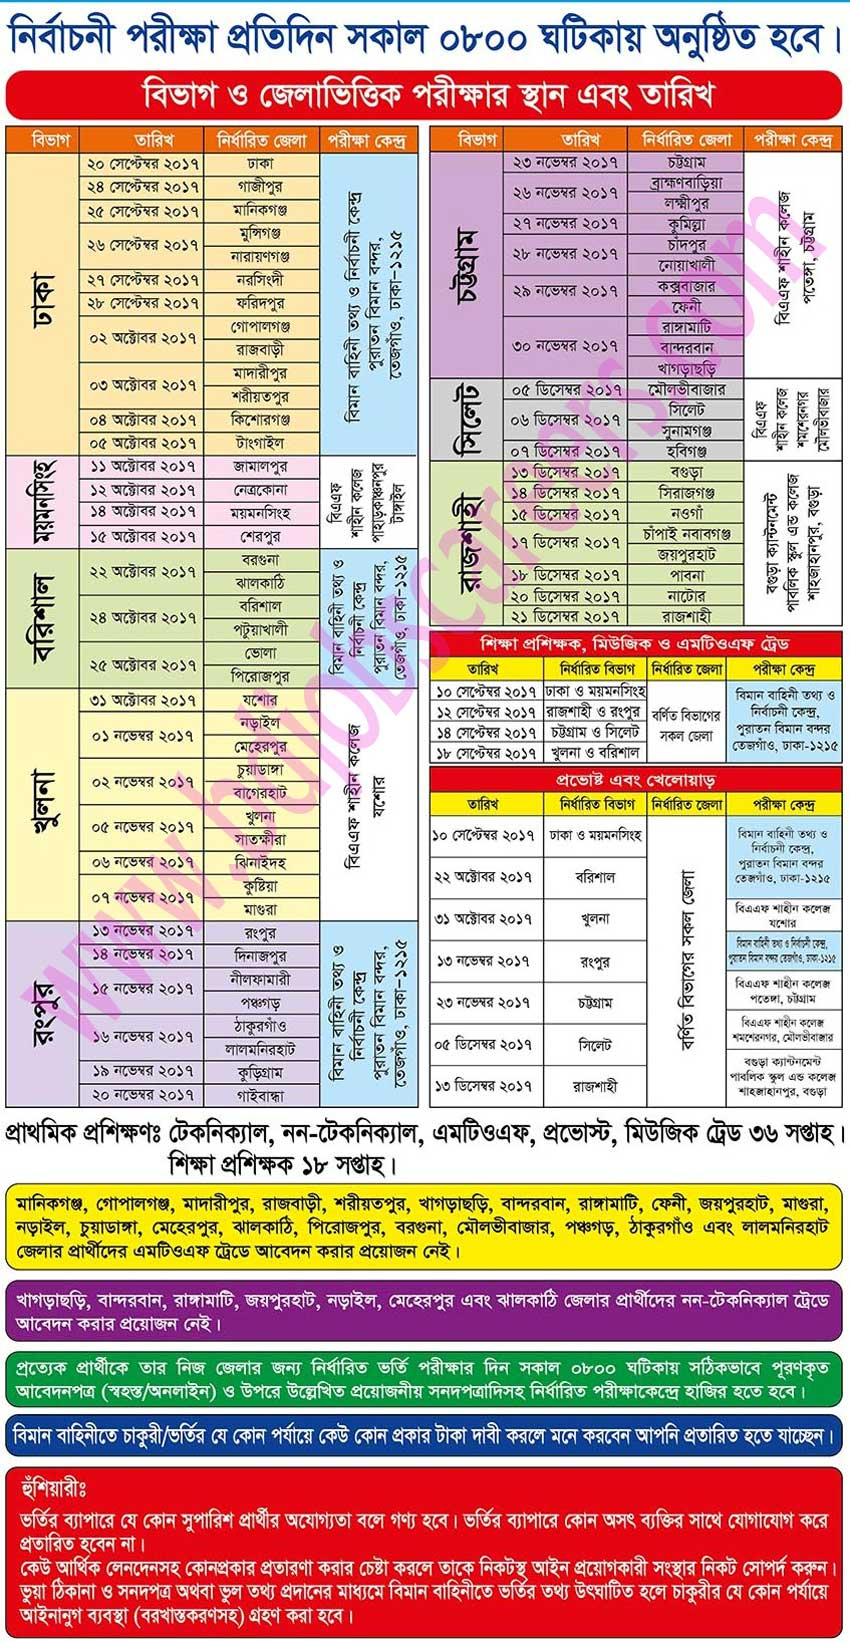 Bangladesh Air Force Job Circular 2017 Information